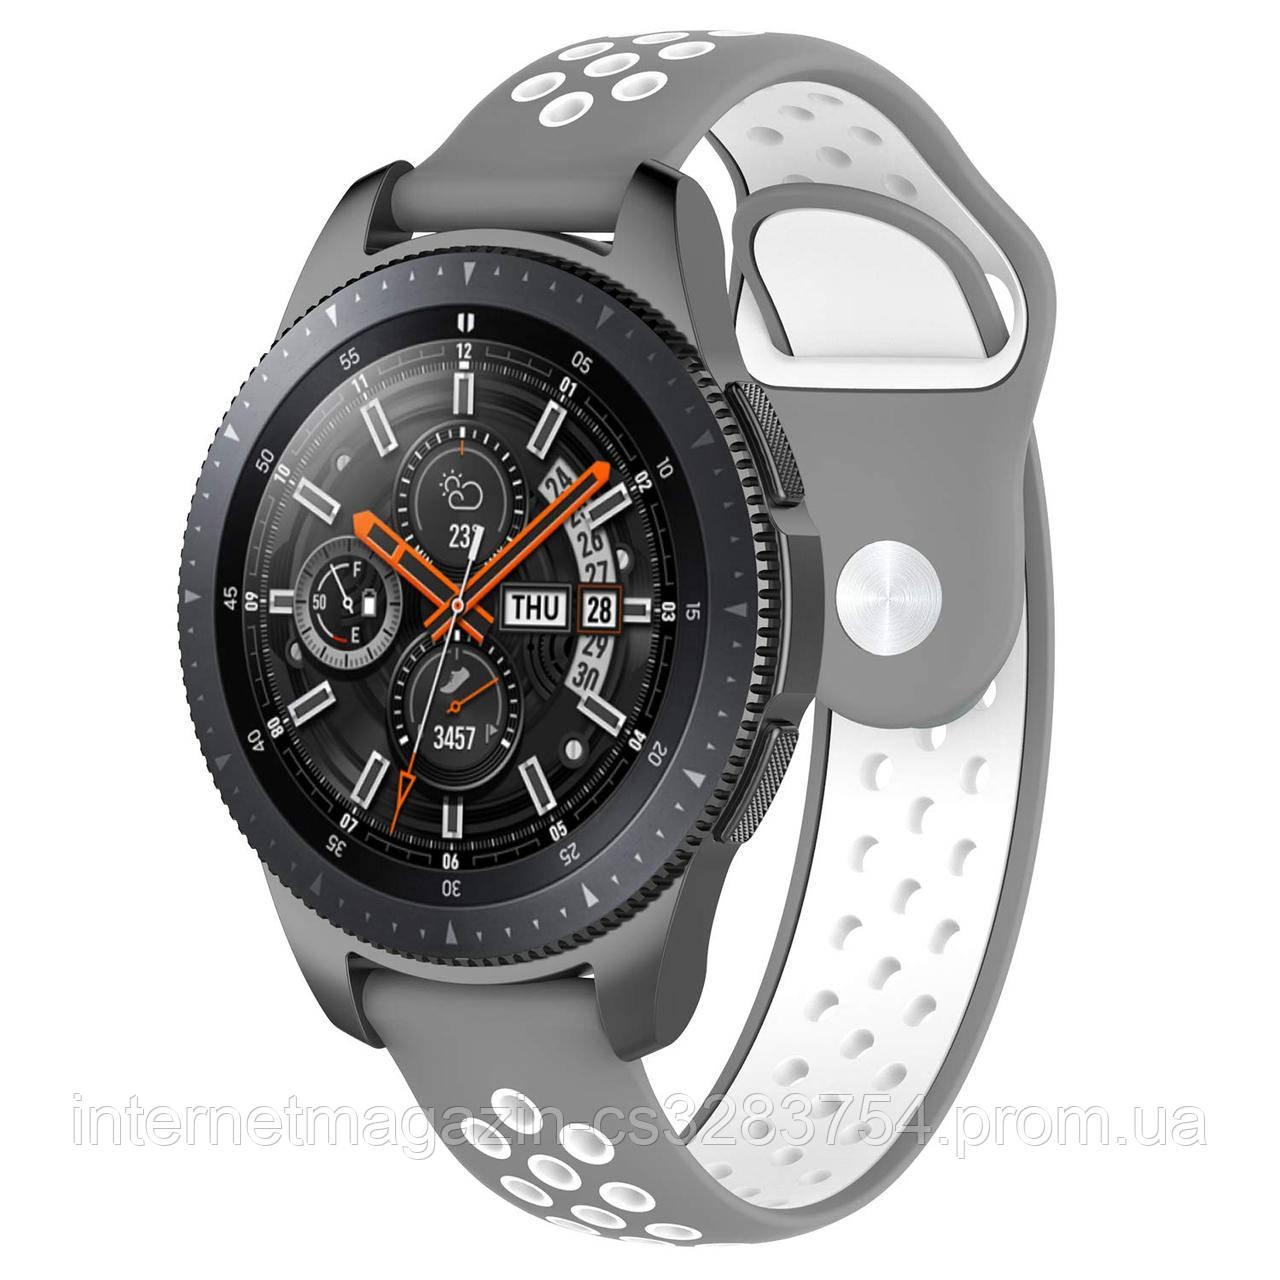 Ремінець BeWatch sport-style для Samsung Galaxy Watch 46 мм Сіро-Білий (1020142)